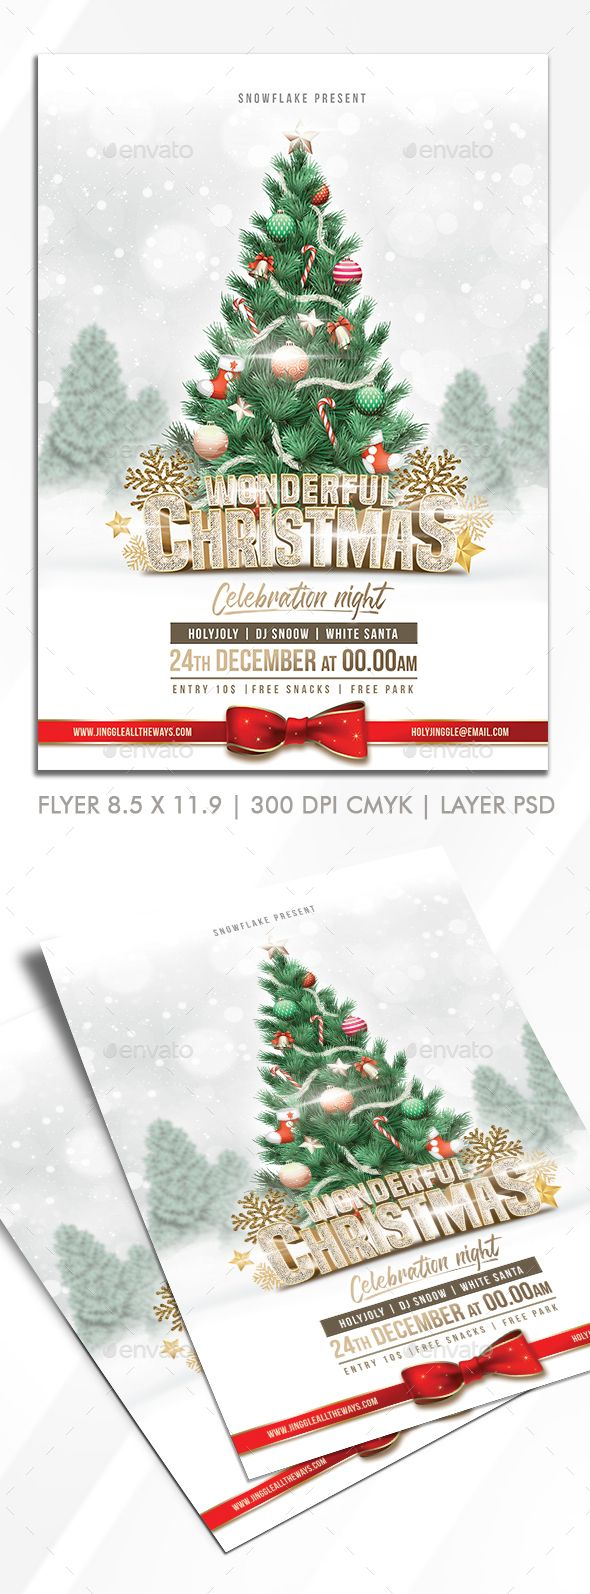 Christmas Party Flyer Design Christmas Flyer Flyer Design Flyer